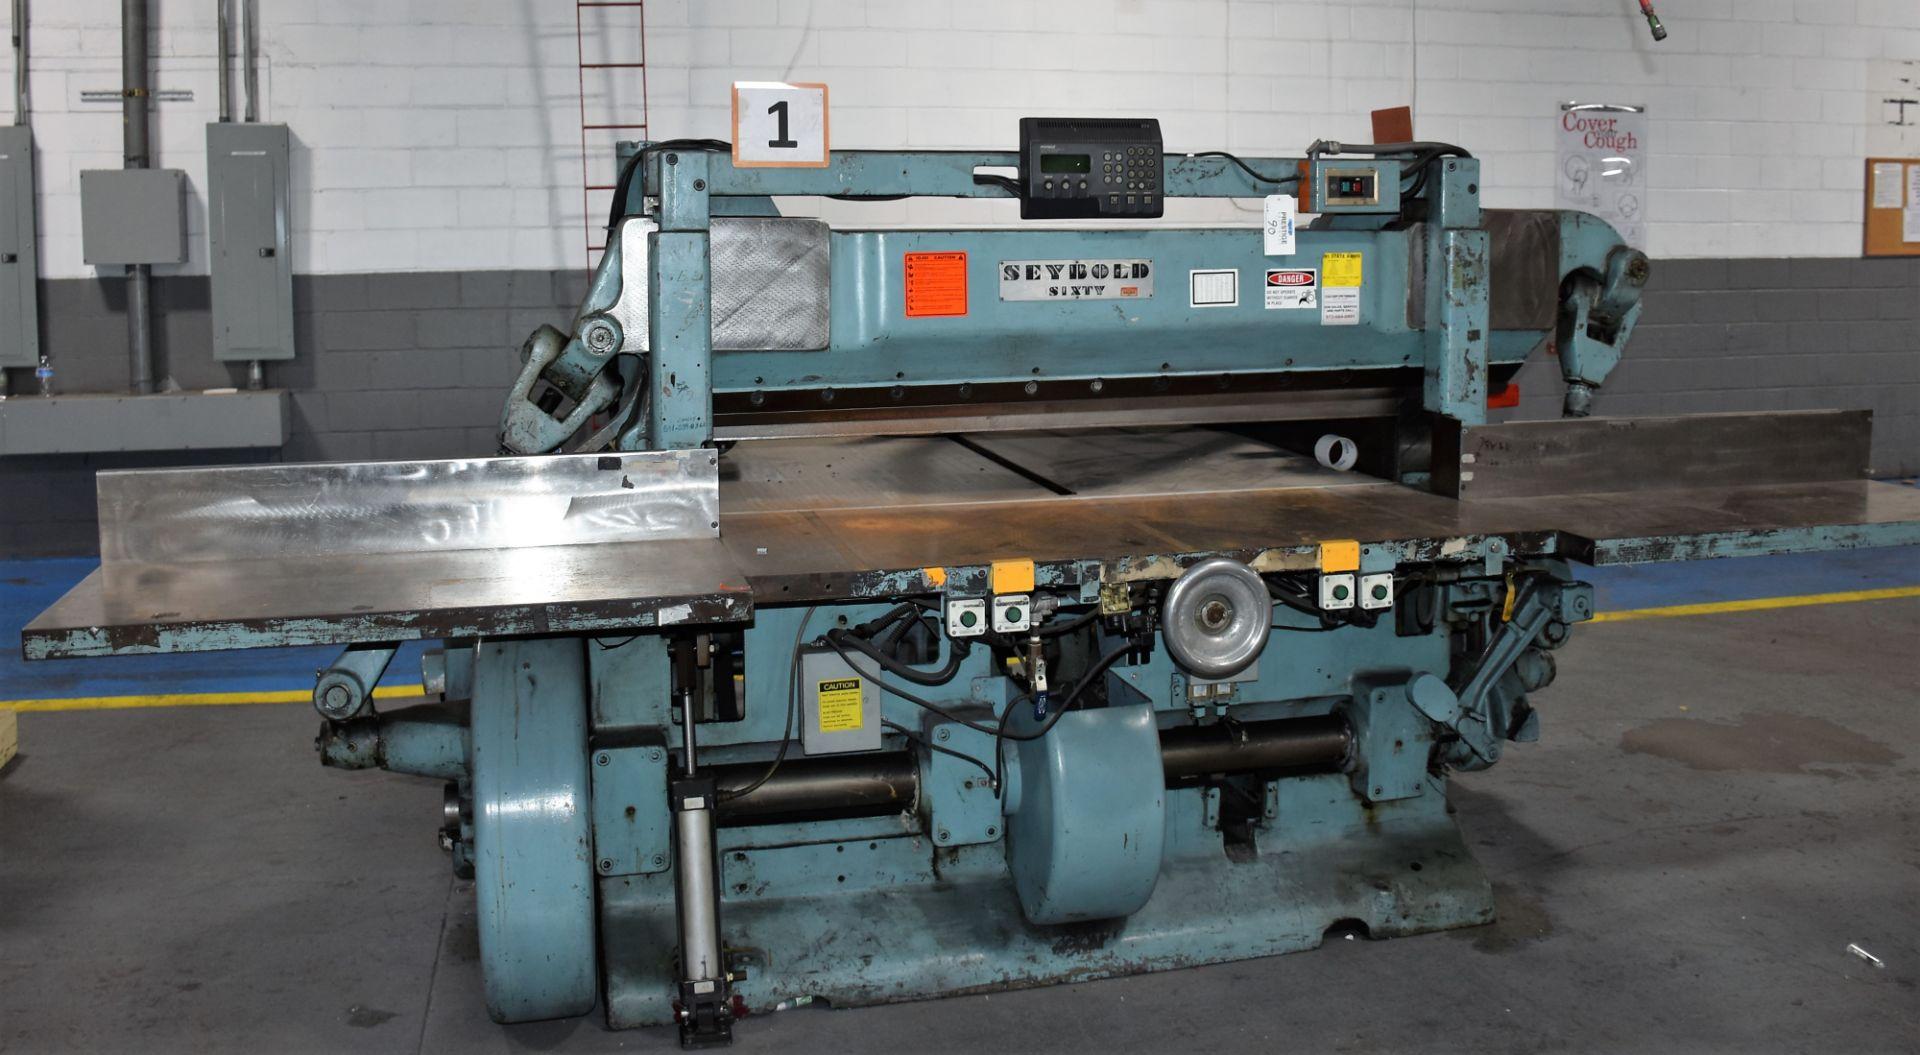 Seybold Paper Cutter, S-64